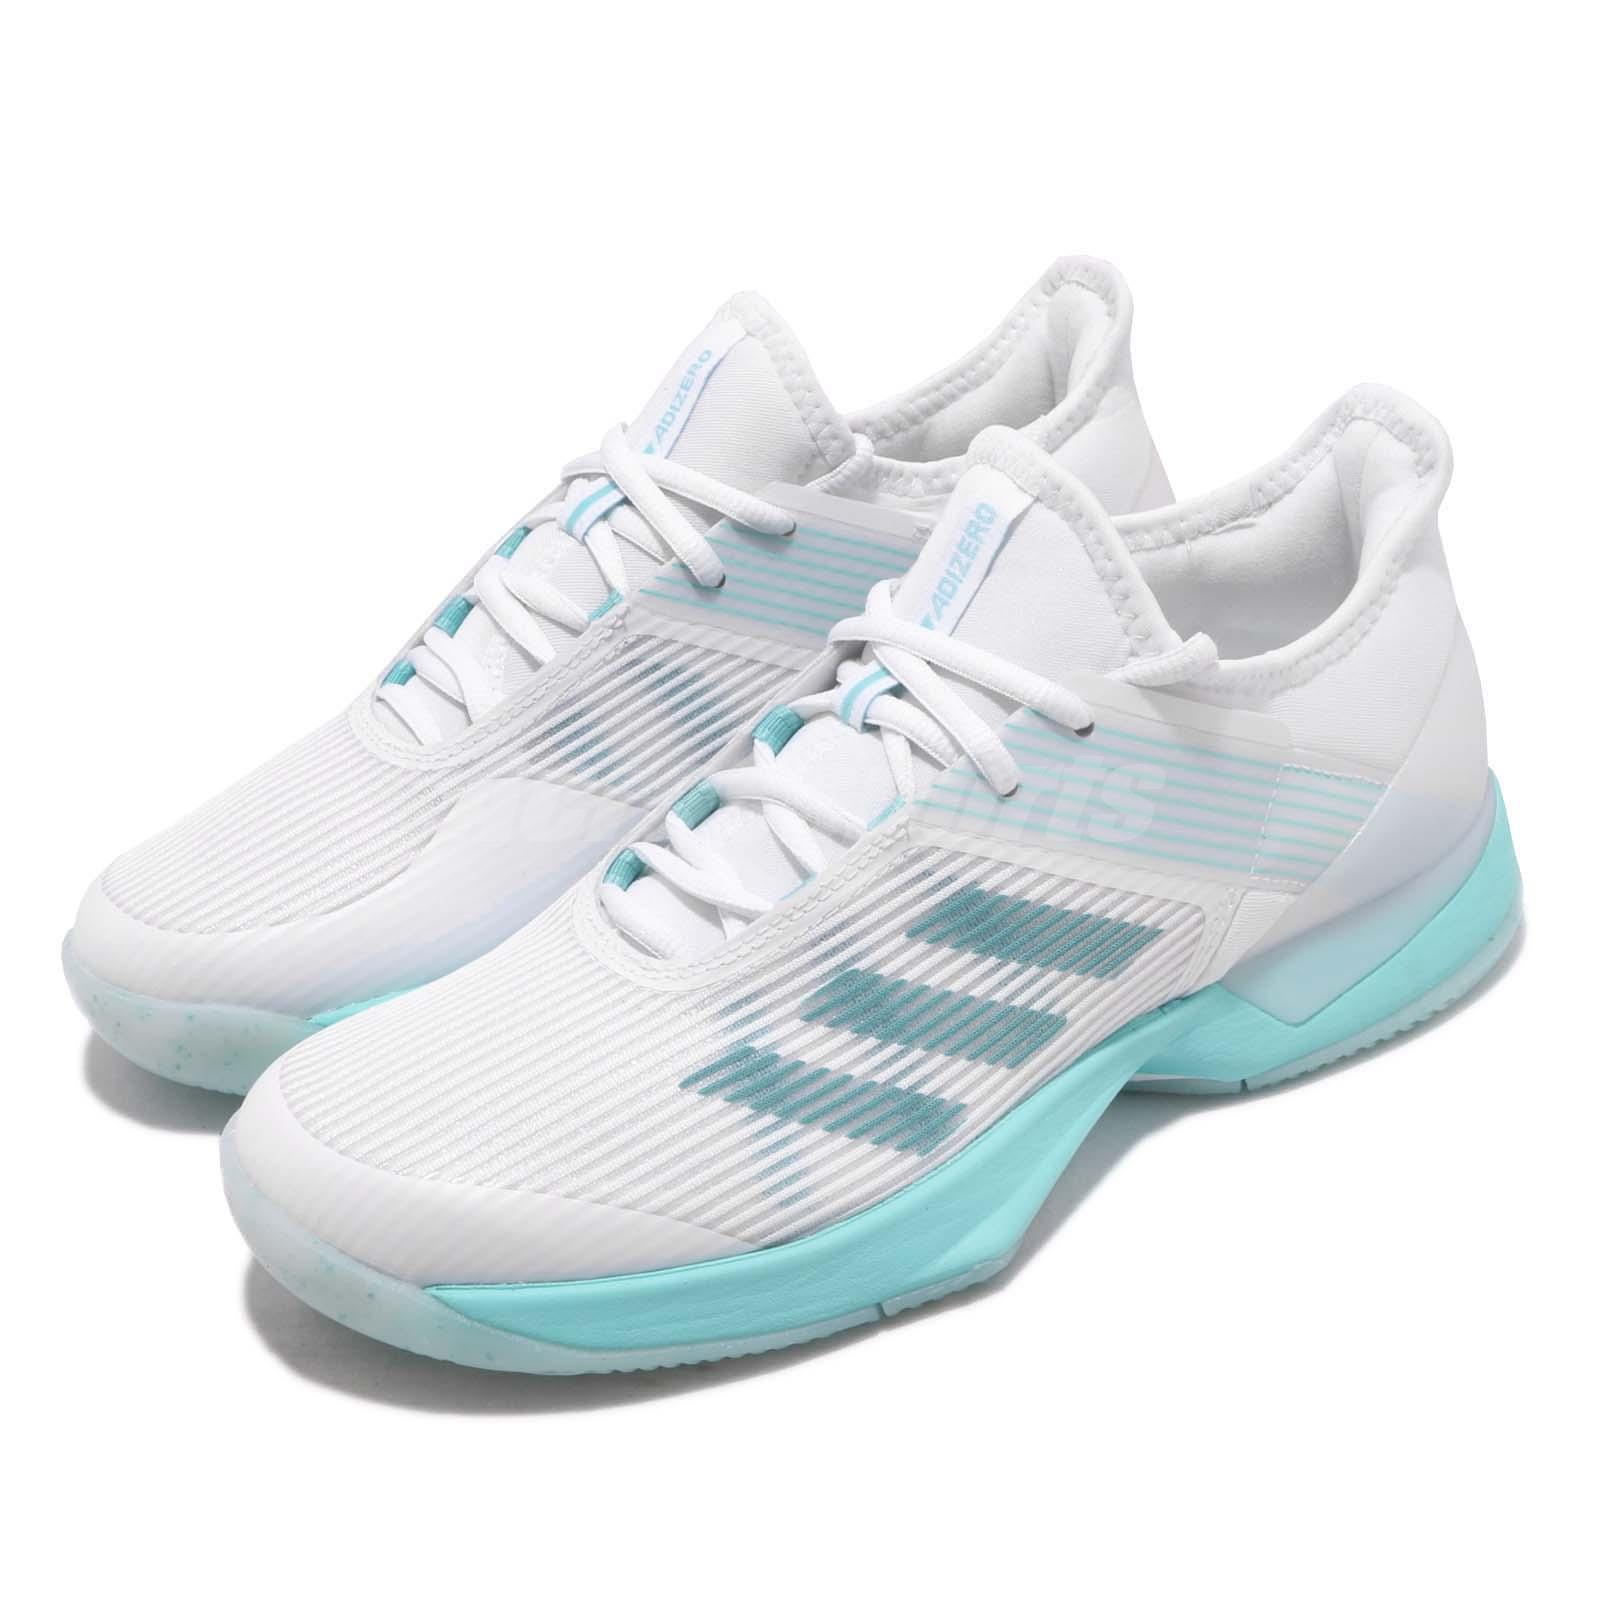 dc6f4cb4d0b Details about adidas Adizero Ubersonic 3 W X Parley Blue Spirit White Women  Tennis Shoe CG6443